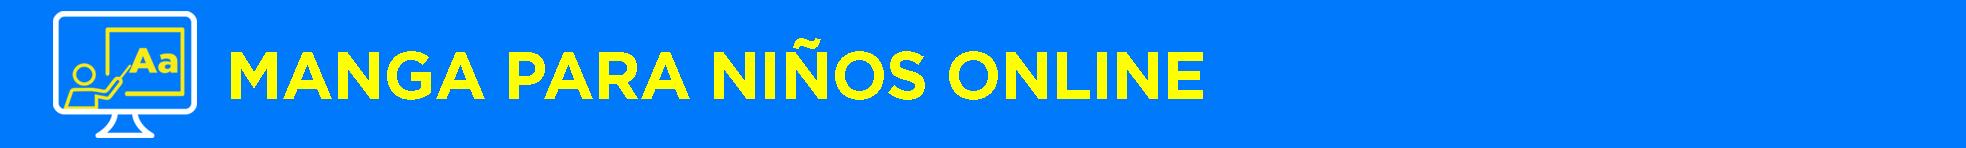 Banner título Manga para niños Online